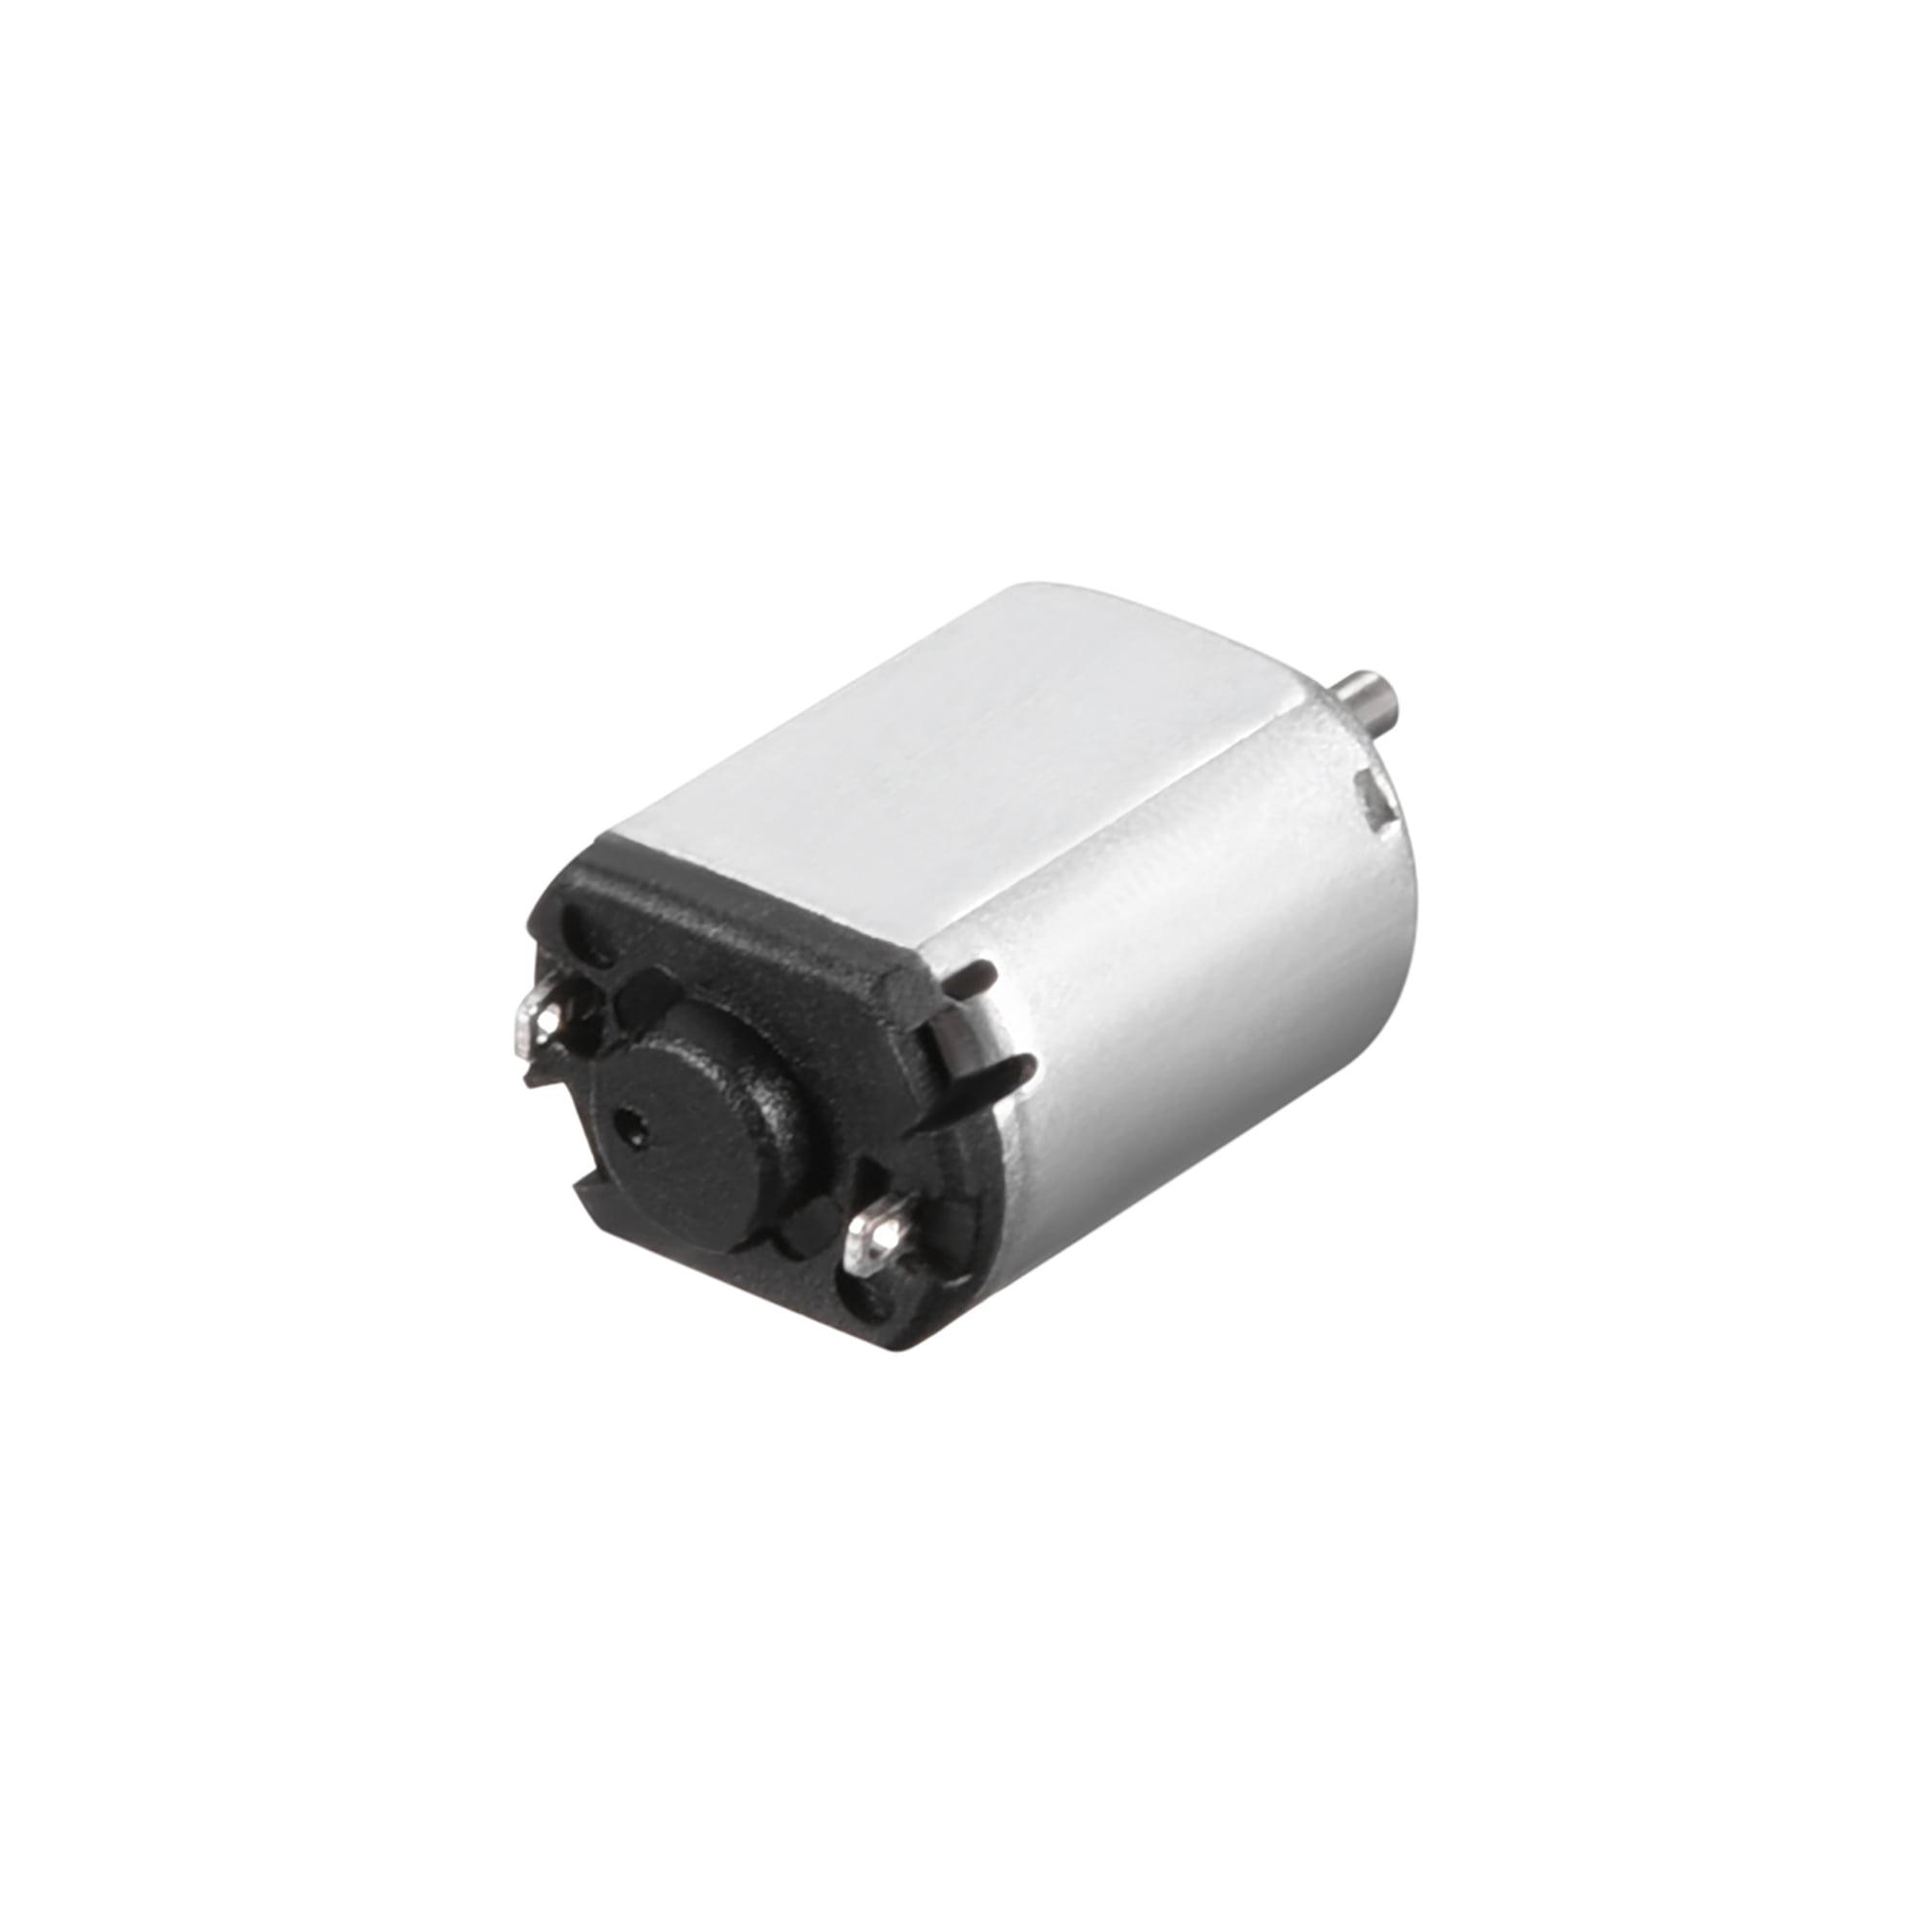 Motor DC 1.5V 9000-9600RPM High Speed Motor for DIY Toy Cars Remote Control - image 2 de 4